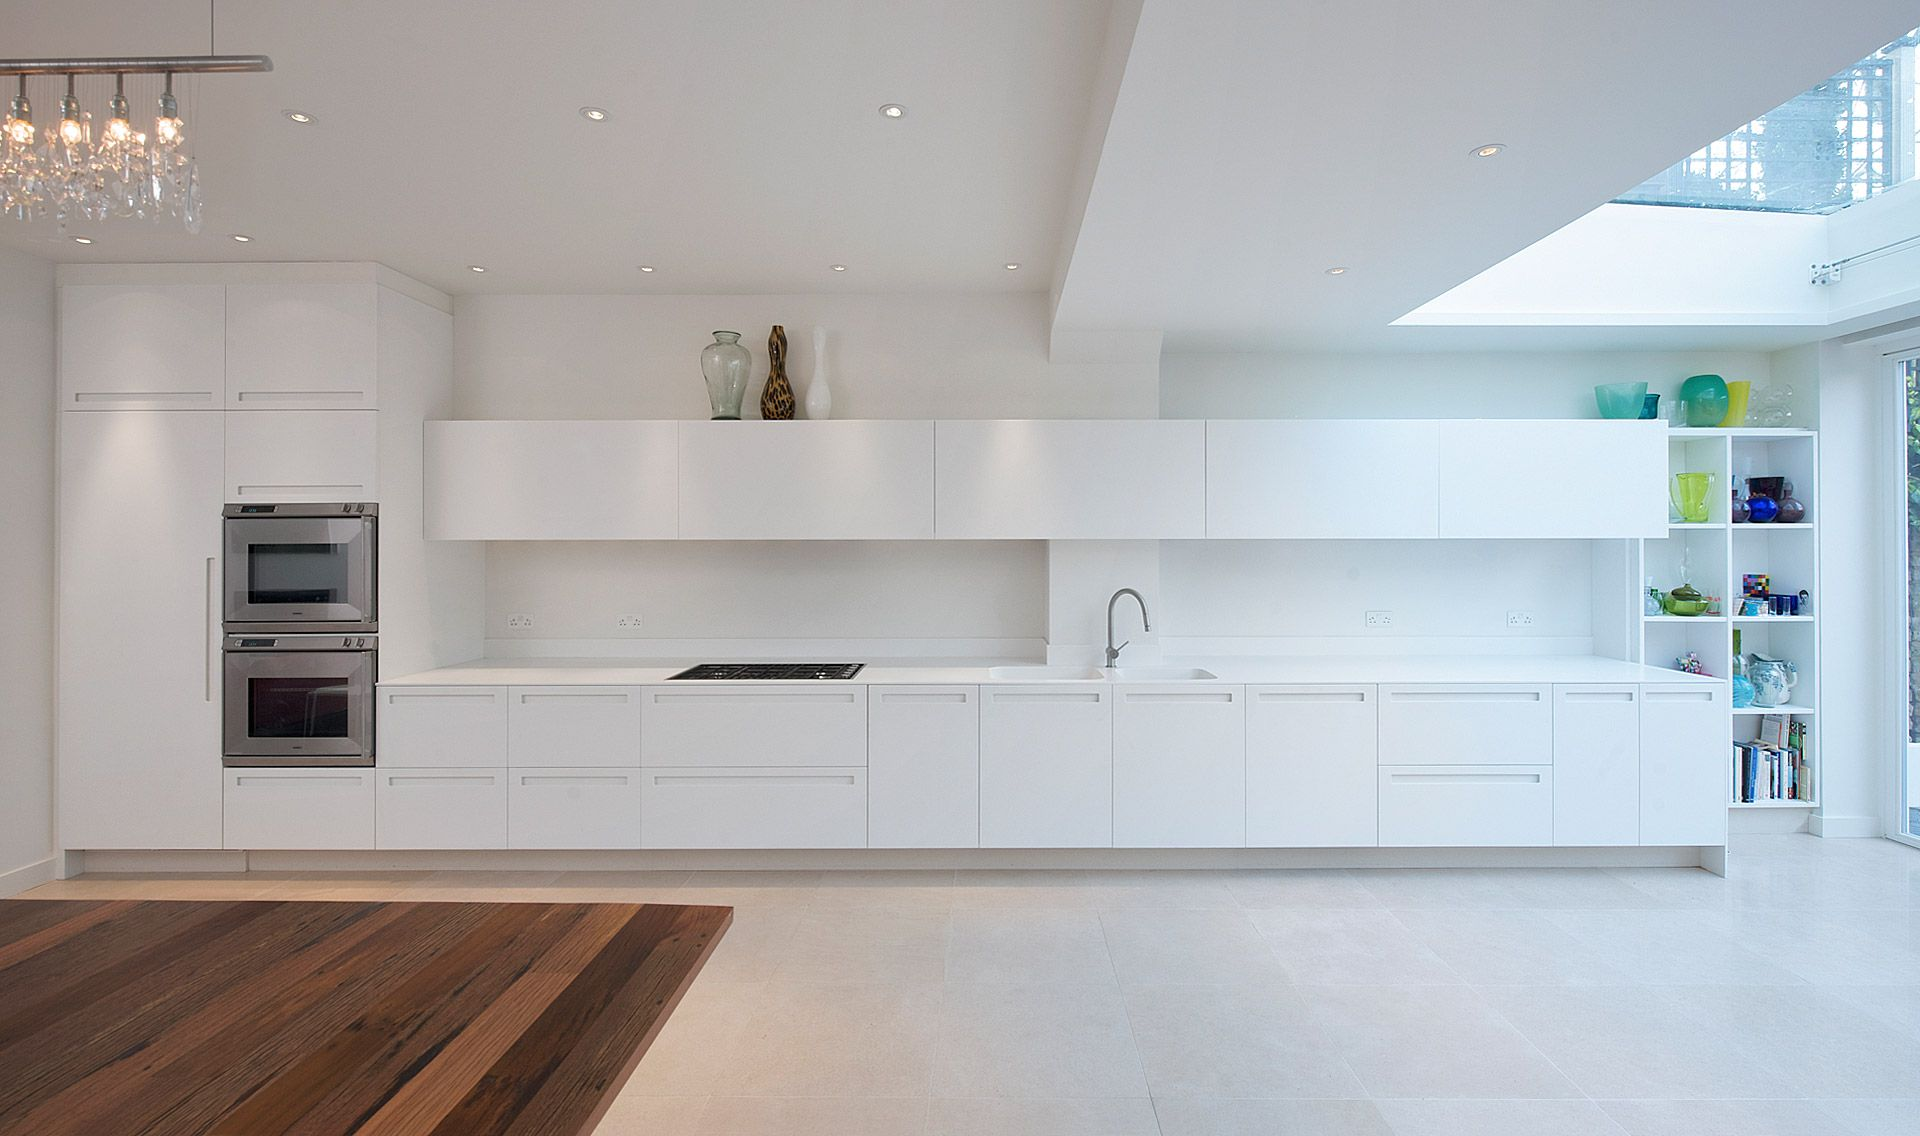 Kitchens - Elgin Crescent - TinTab - Contemporary, bespoke, design ...